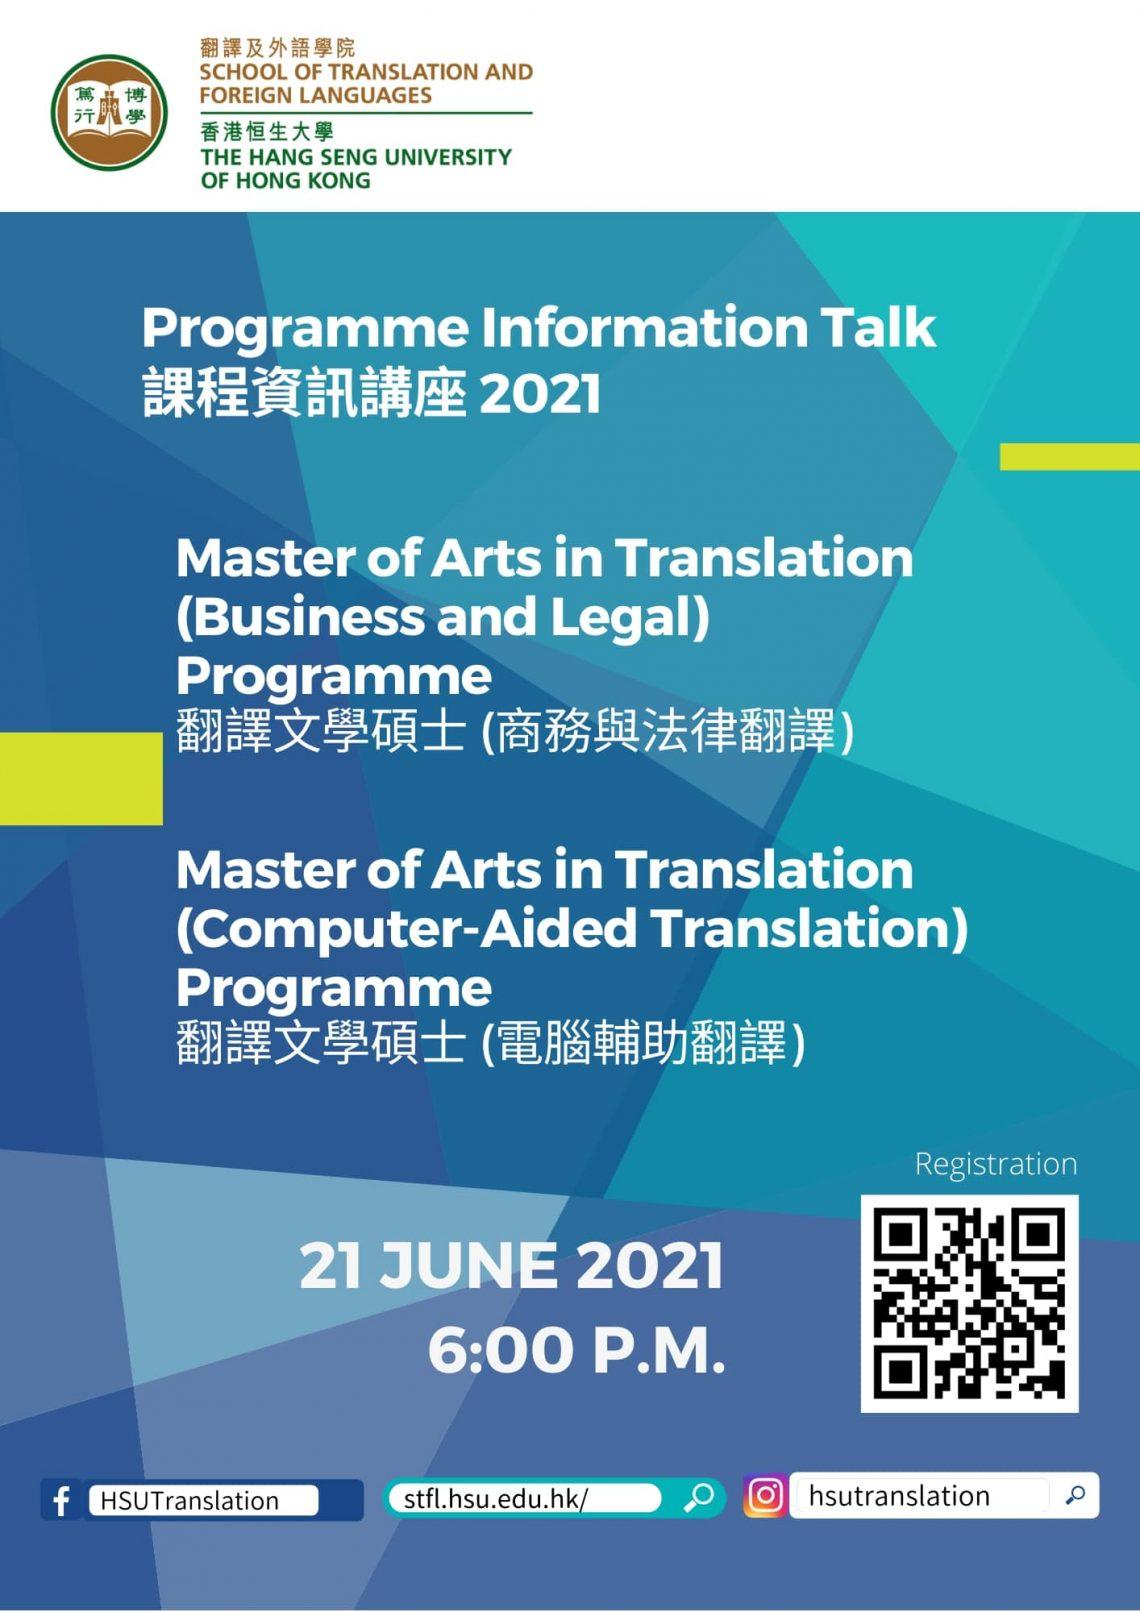 MA Programmes